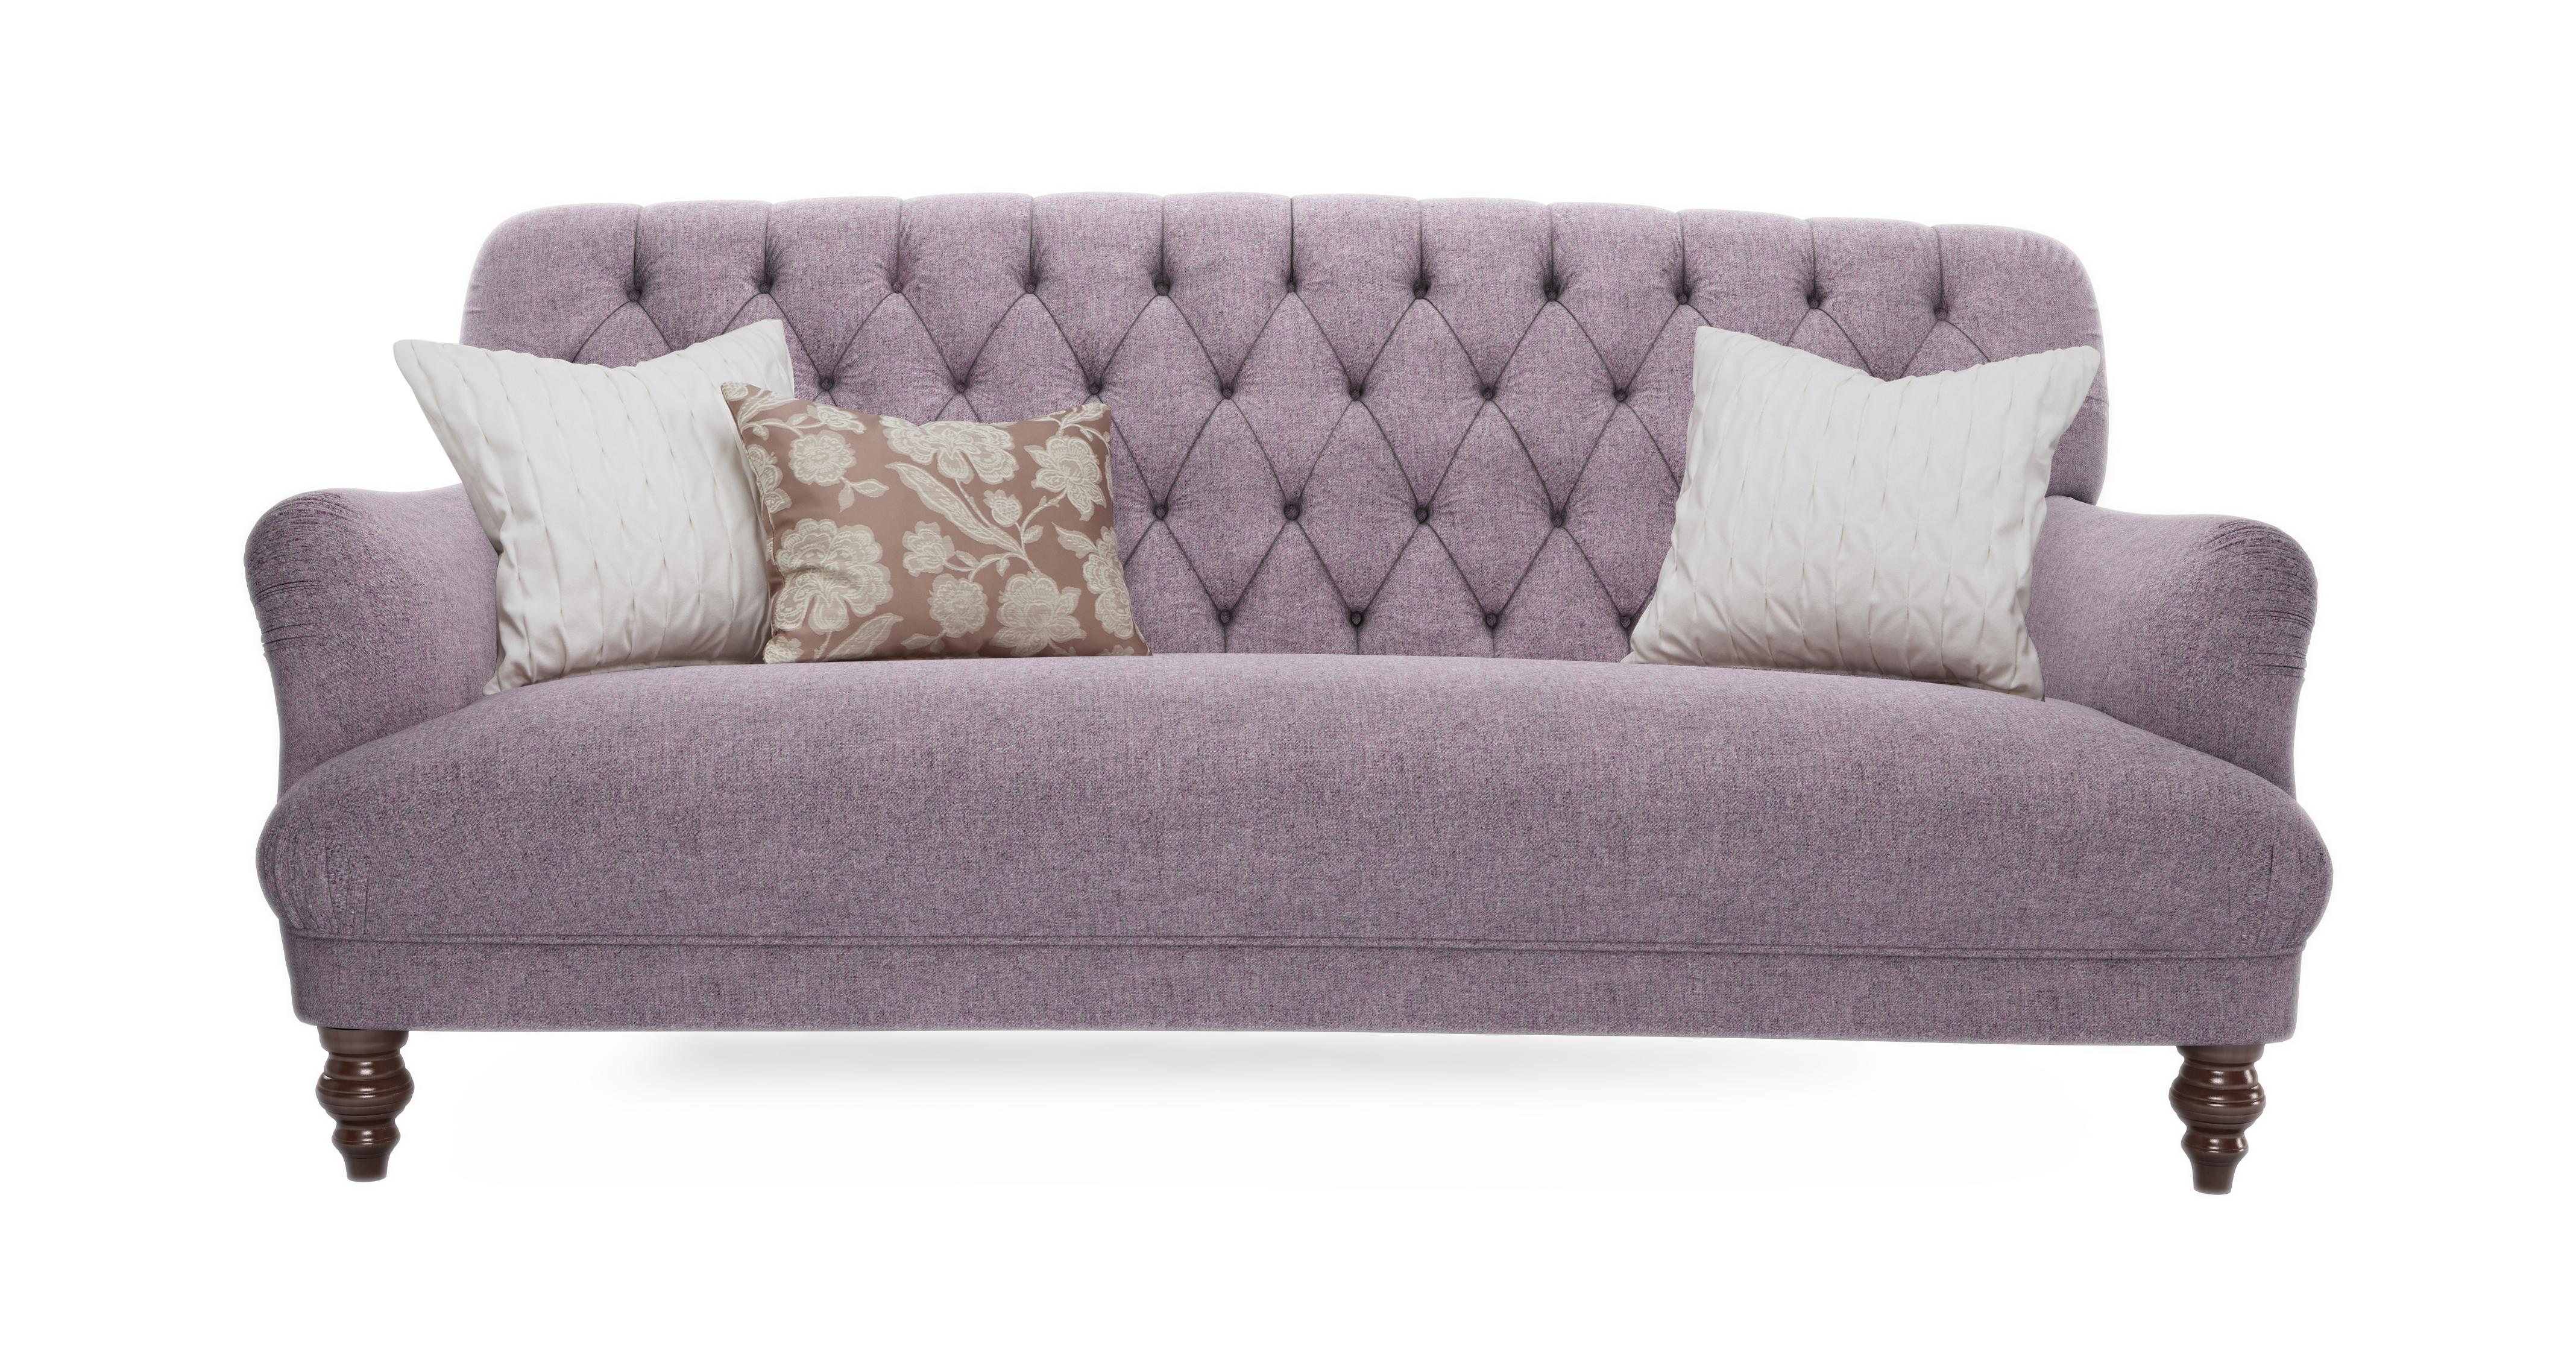 Elegant Bailey Wool Maxi Sofa Bailey Wool | DFS